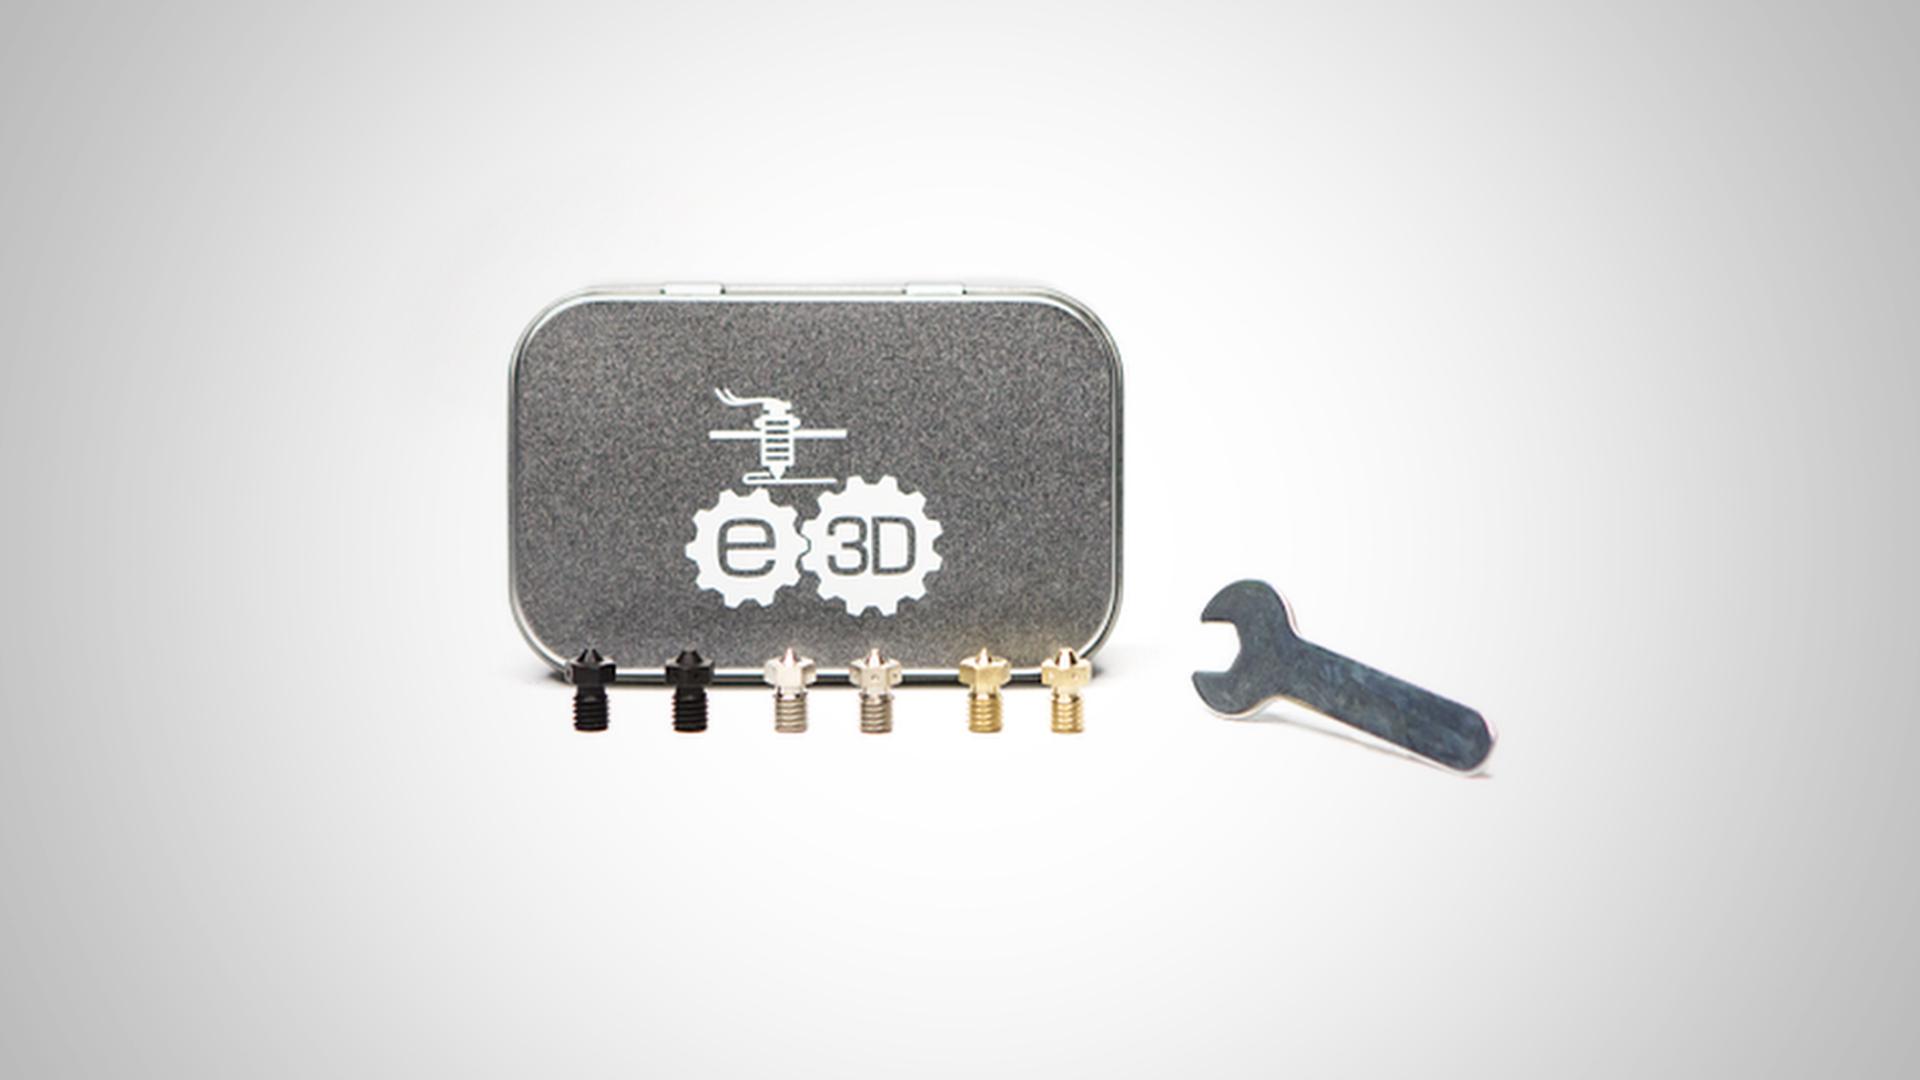 [DEAL] Save Big on E3D 3D Printer Upgrades at MatterHackers | All3DP